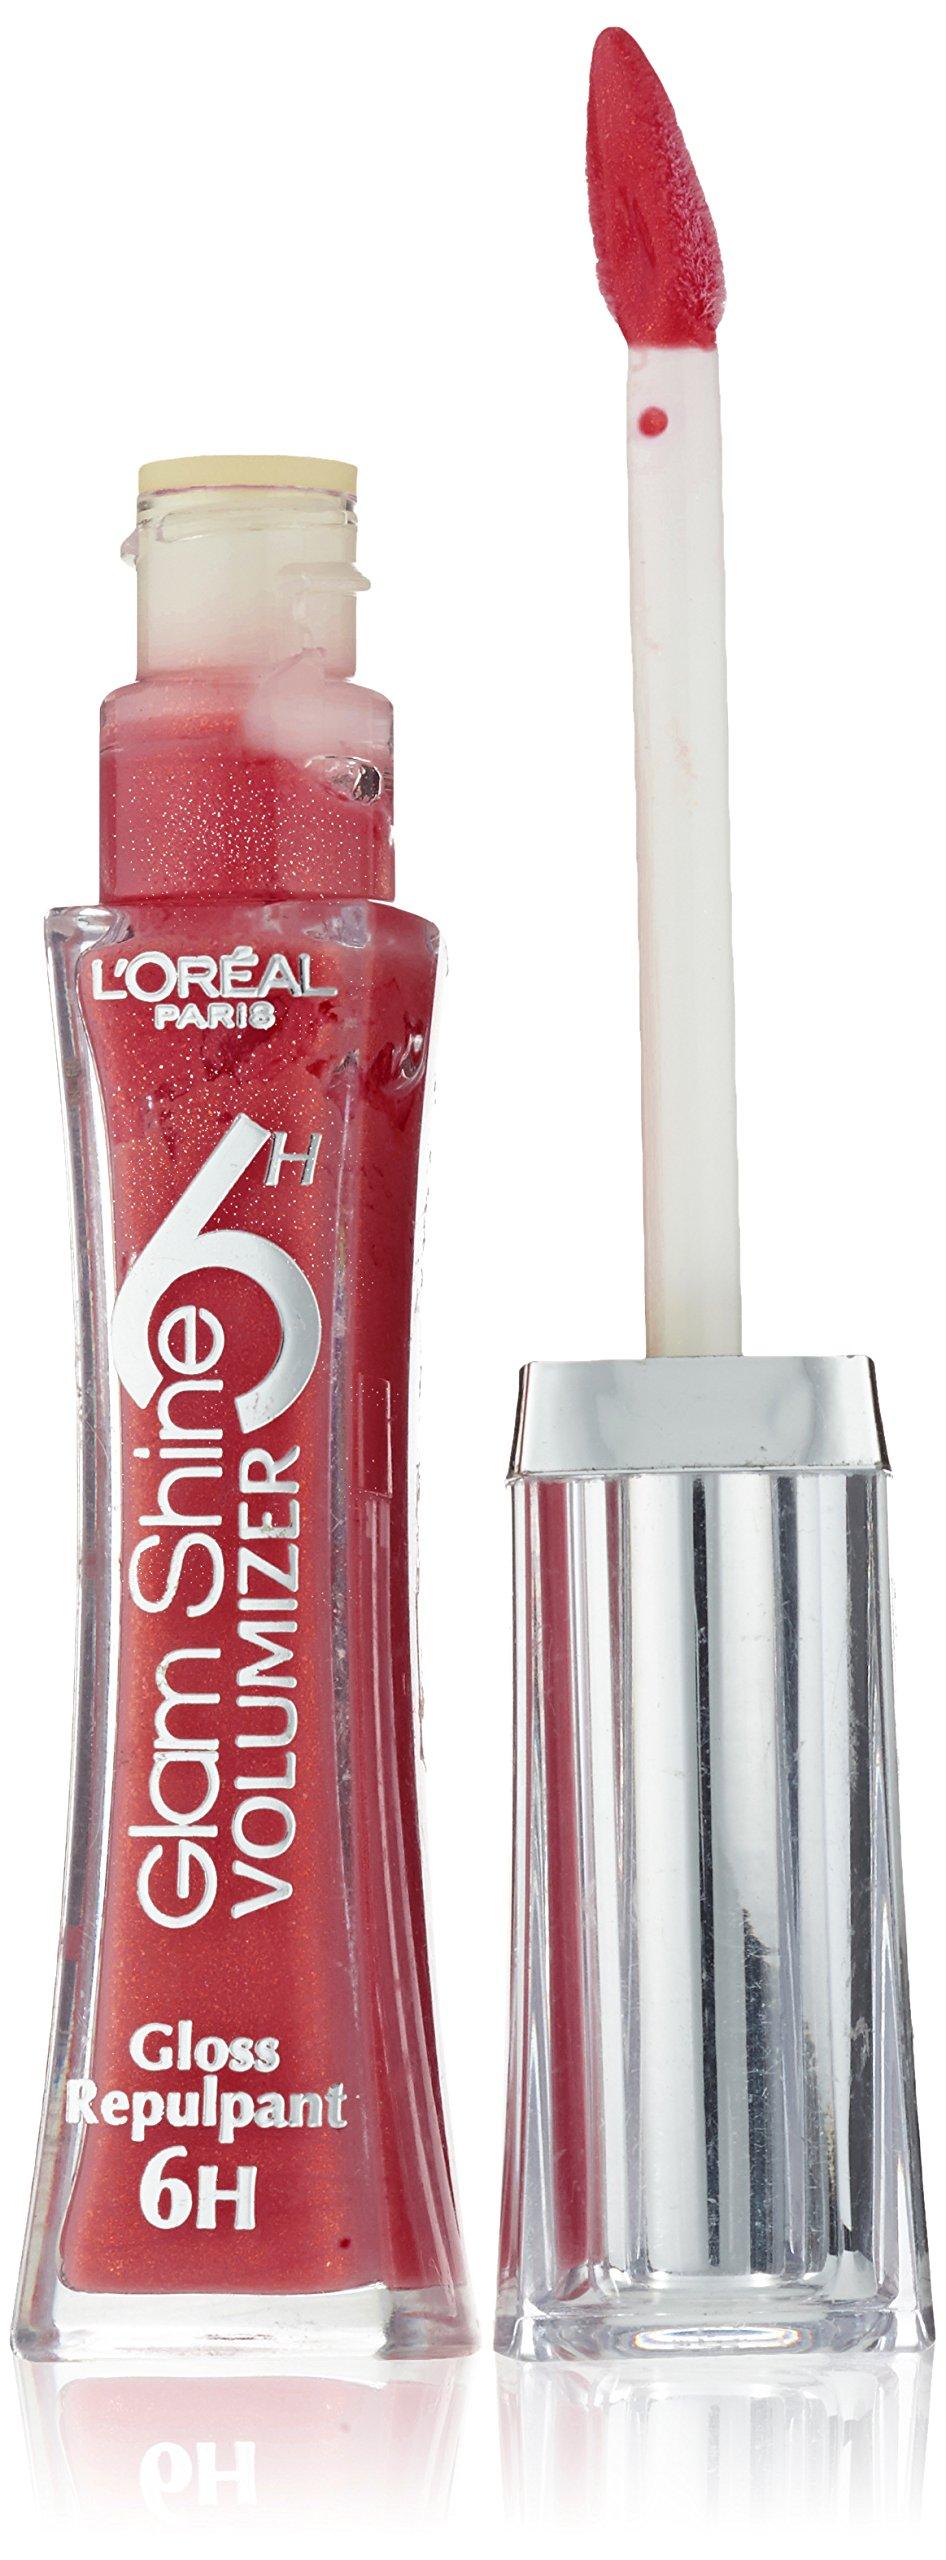 L'Oréal Paris Glam Shine 6H Lucidalabbra